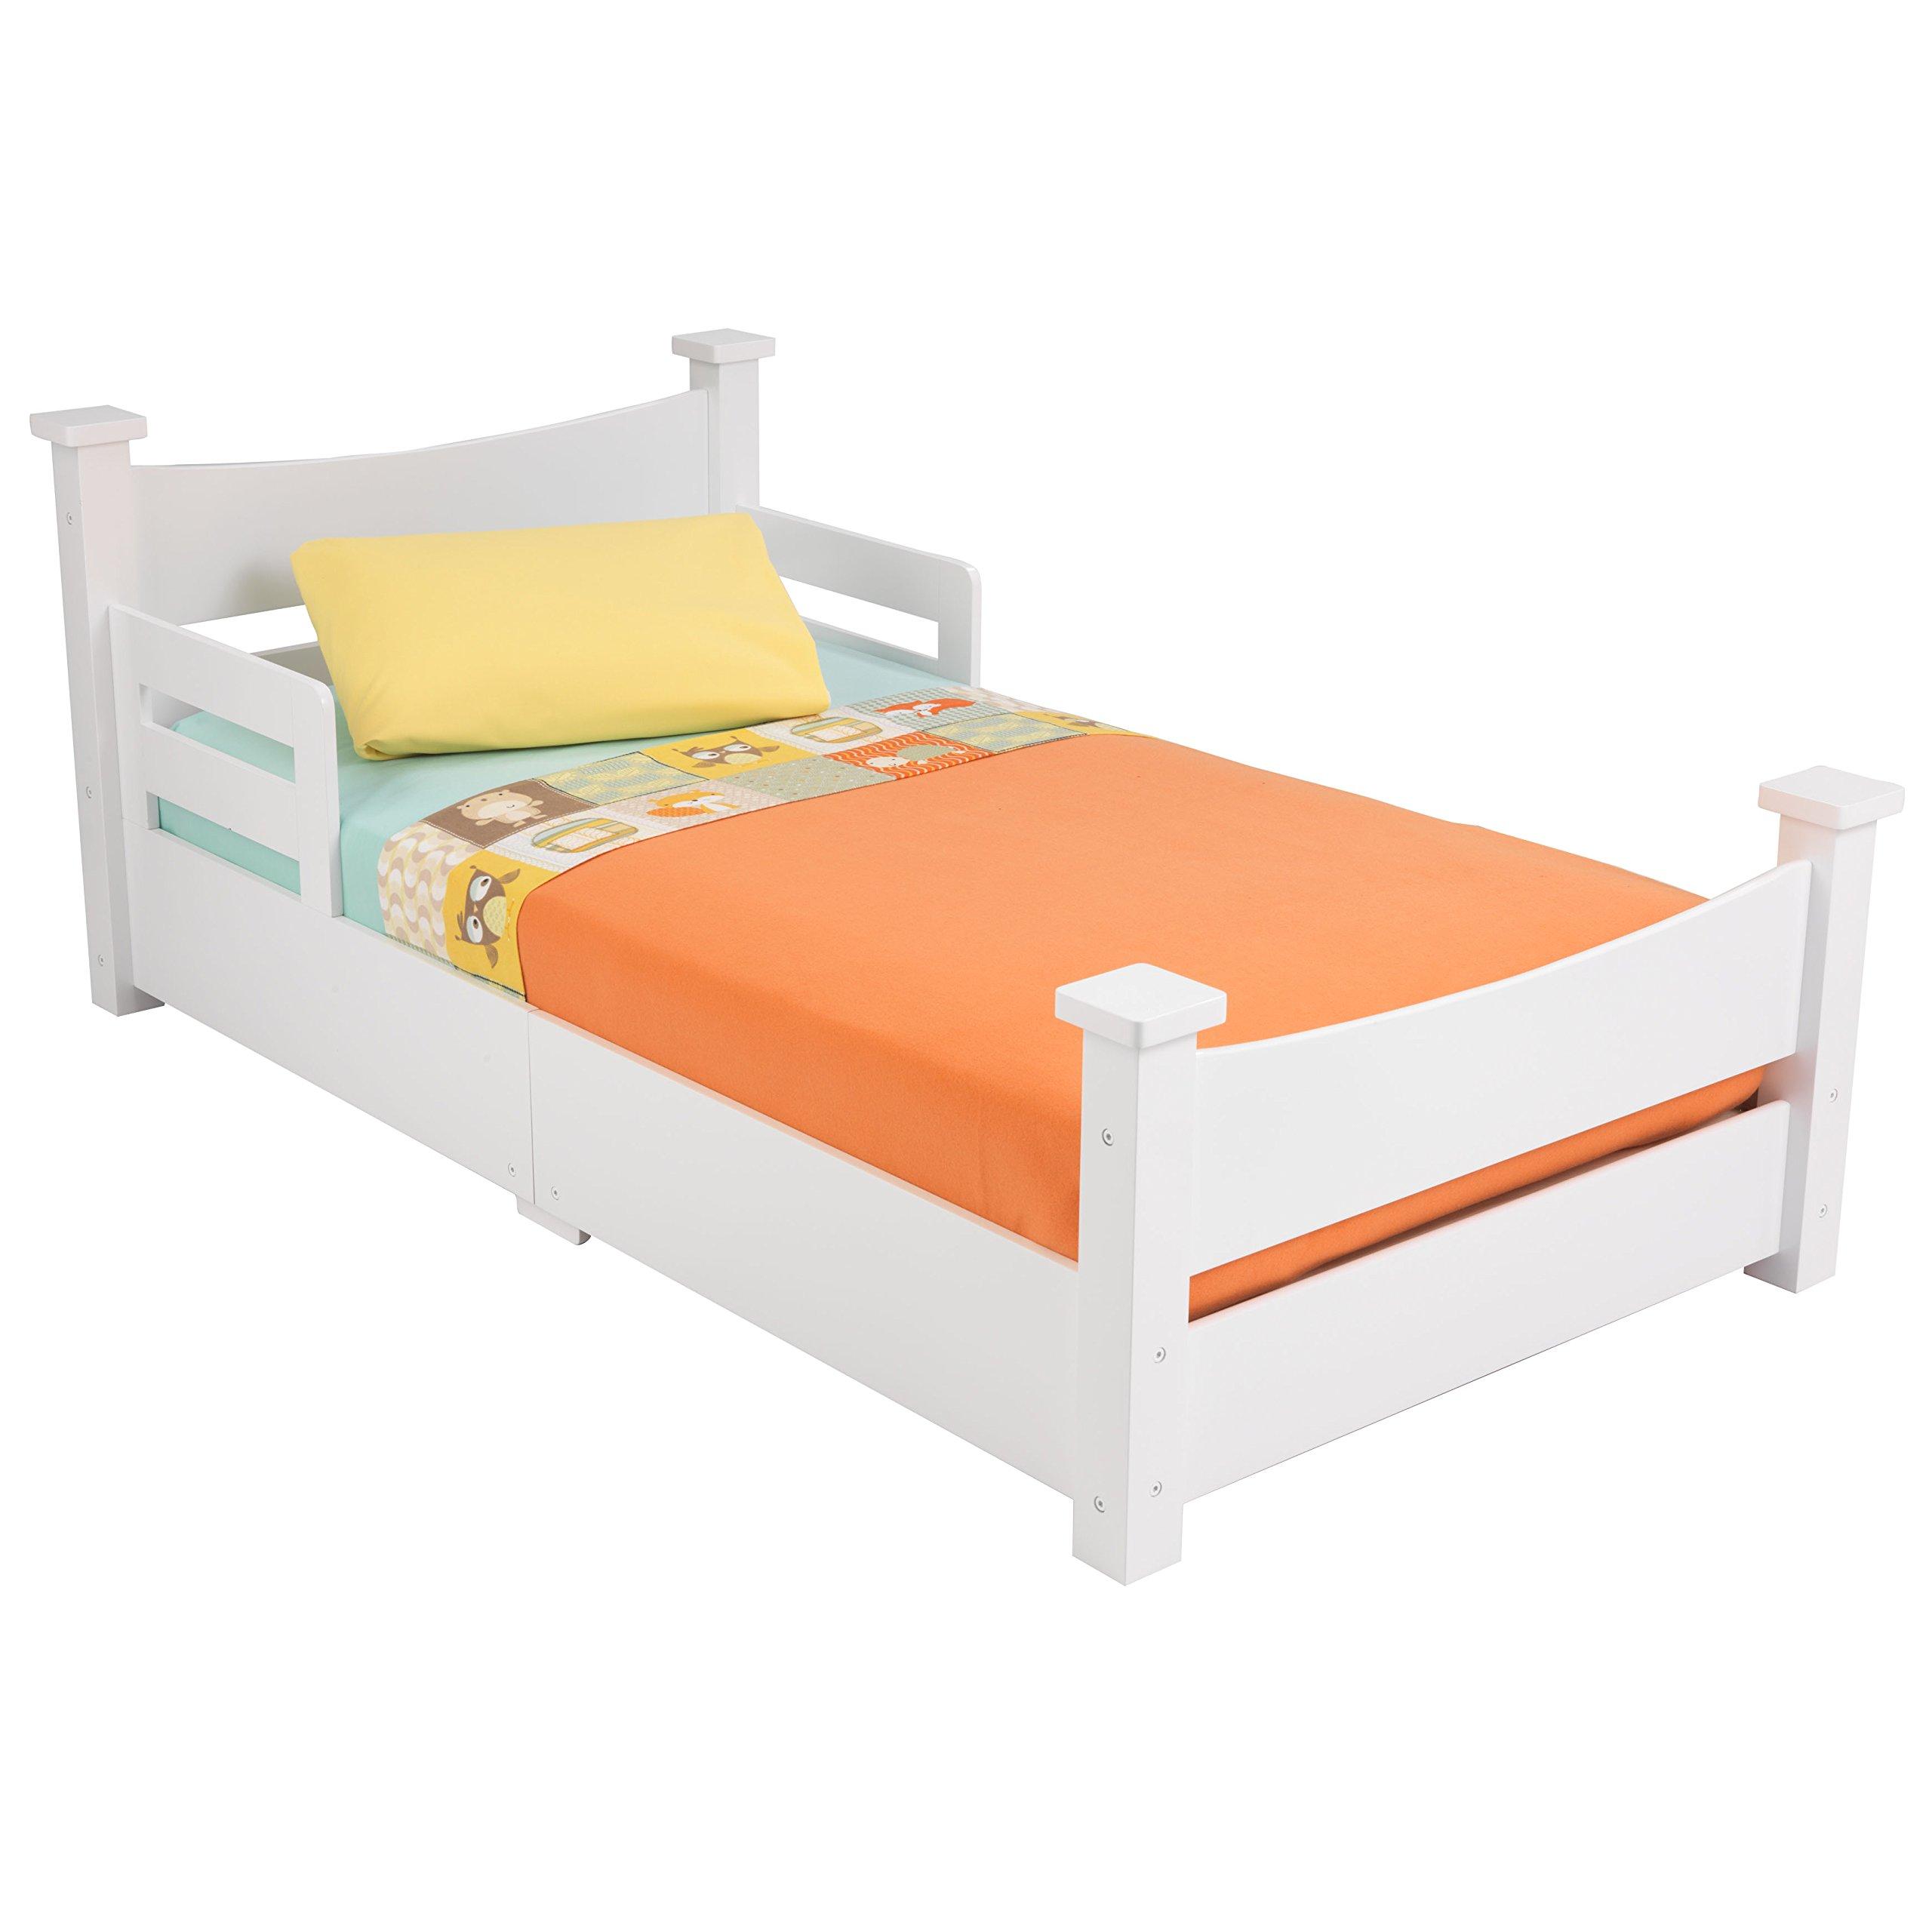 KidKraft Addison Toddler Bed, White by KidKraft